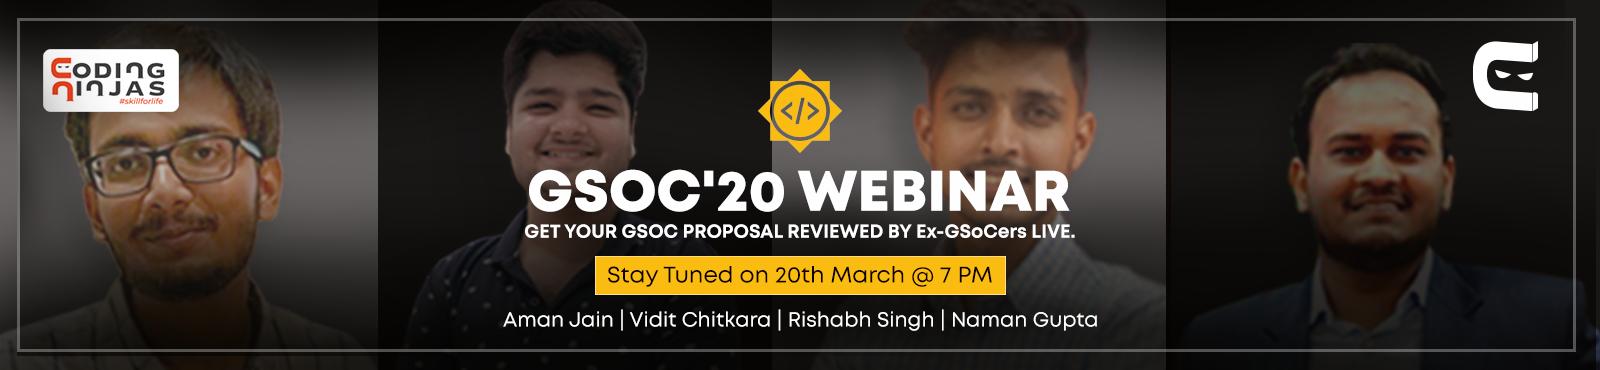 GSoC'20 Webinar